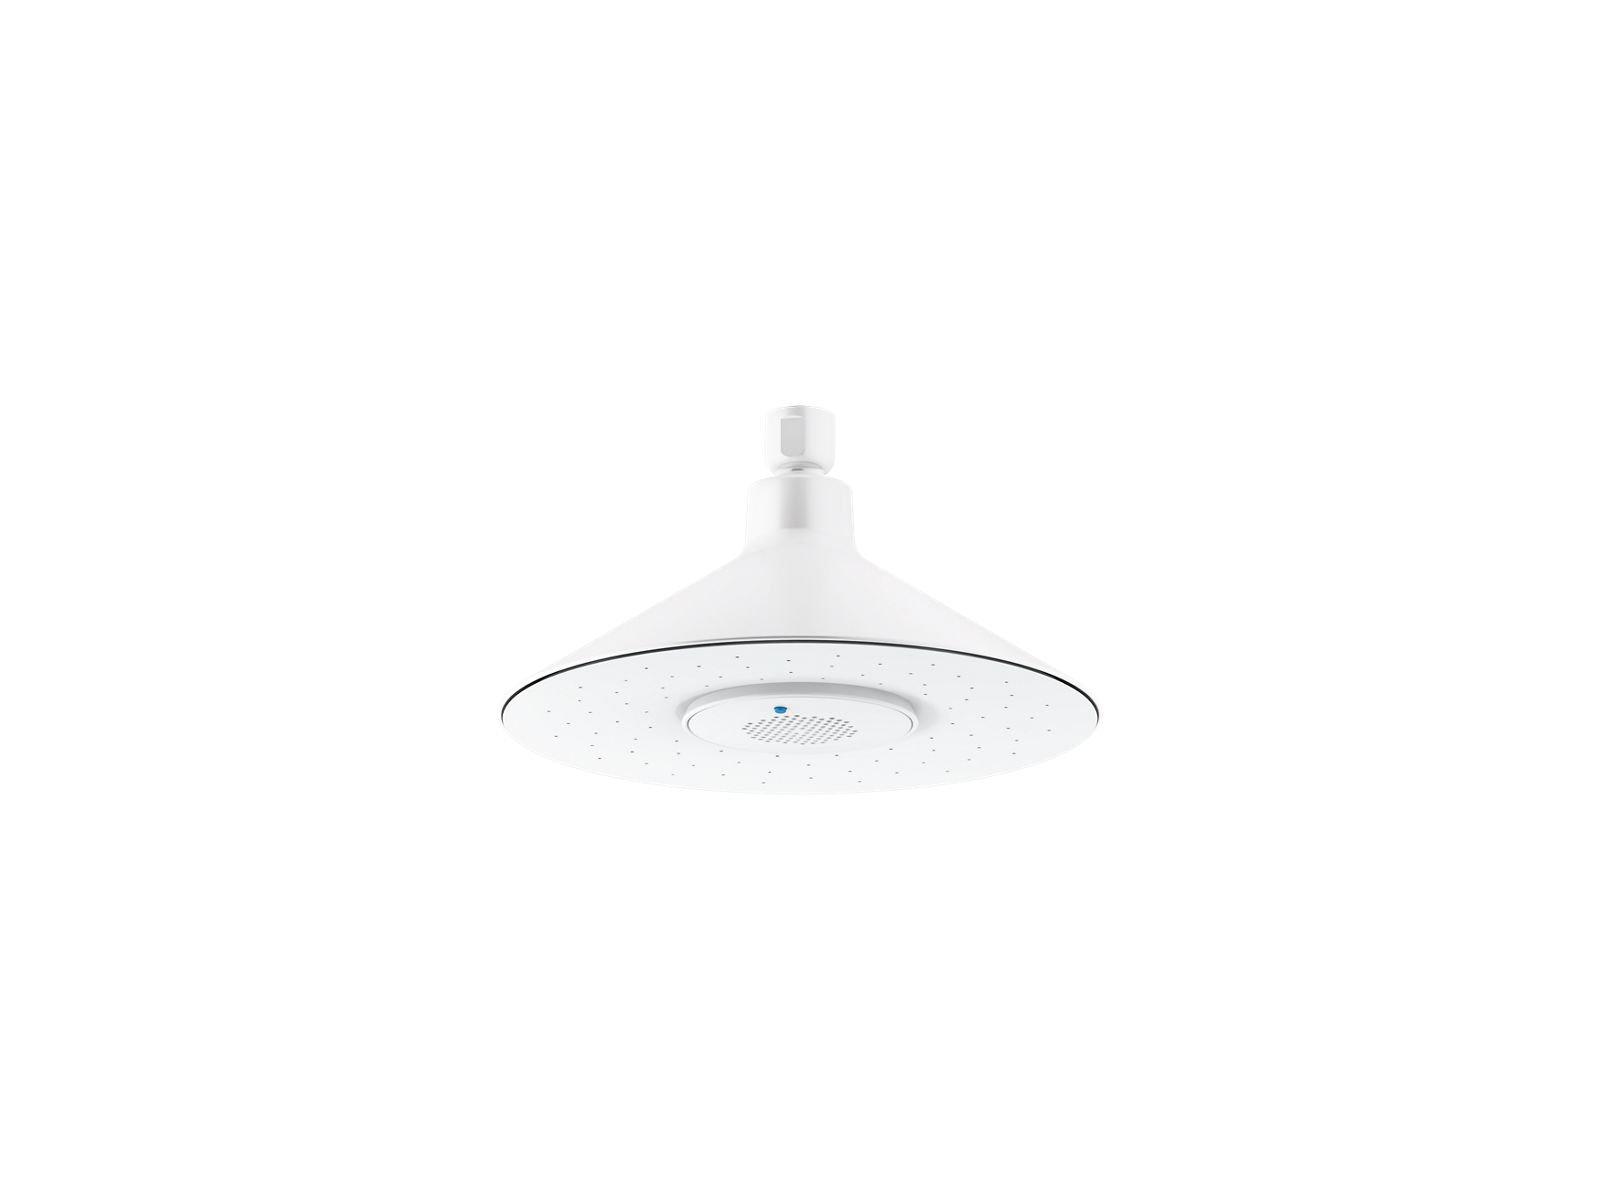 Kohler K-99105-0 Moxie 2.5 Gpm Rainhead with Wireless Speaker in White